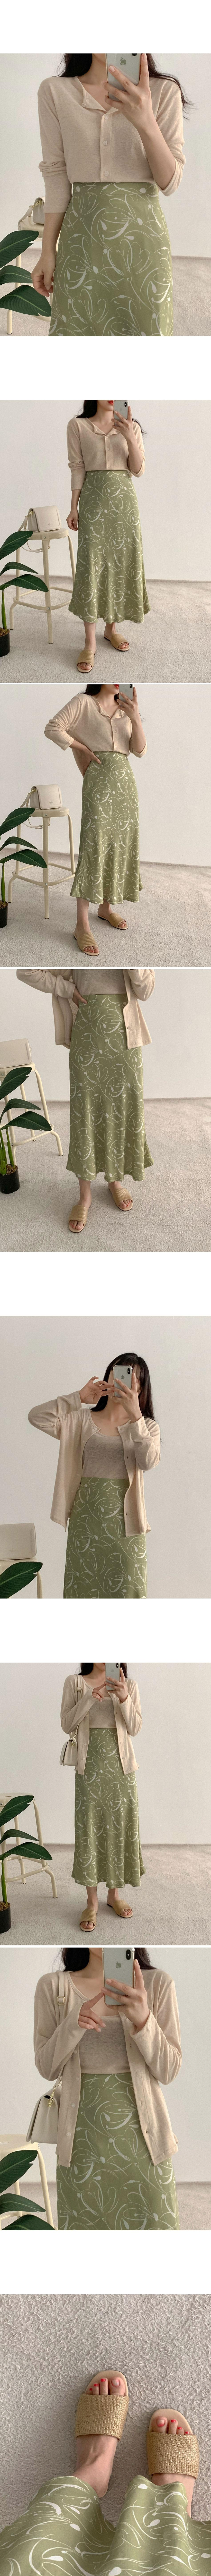 rattan bar slippers